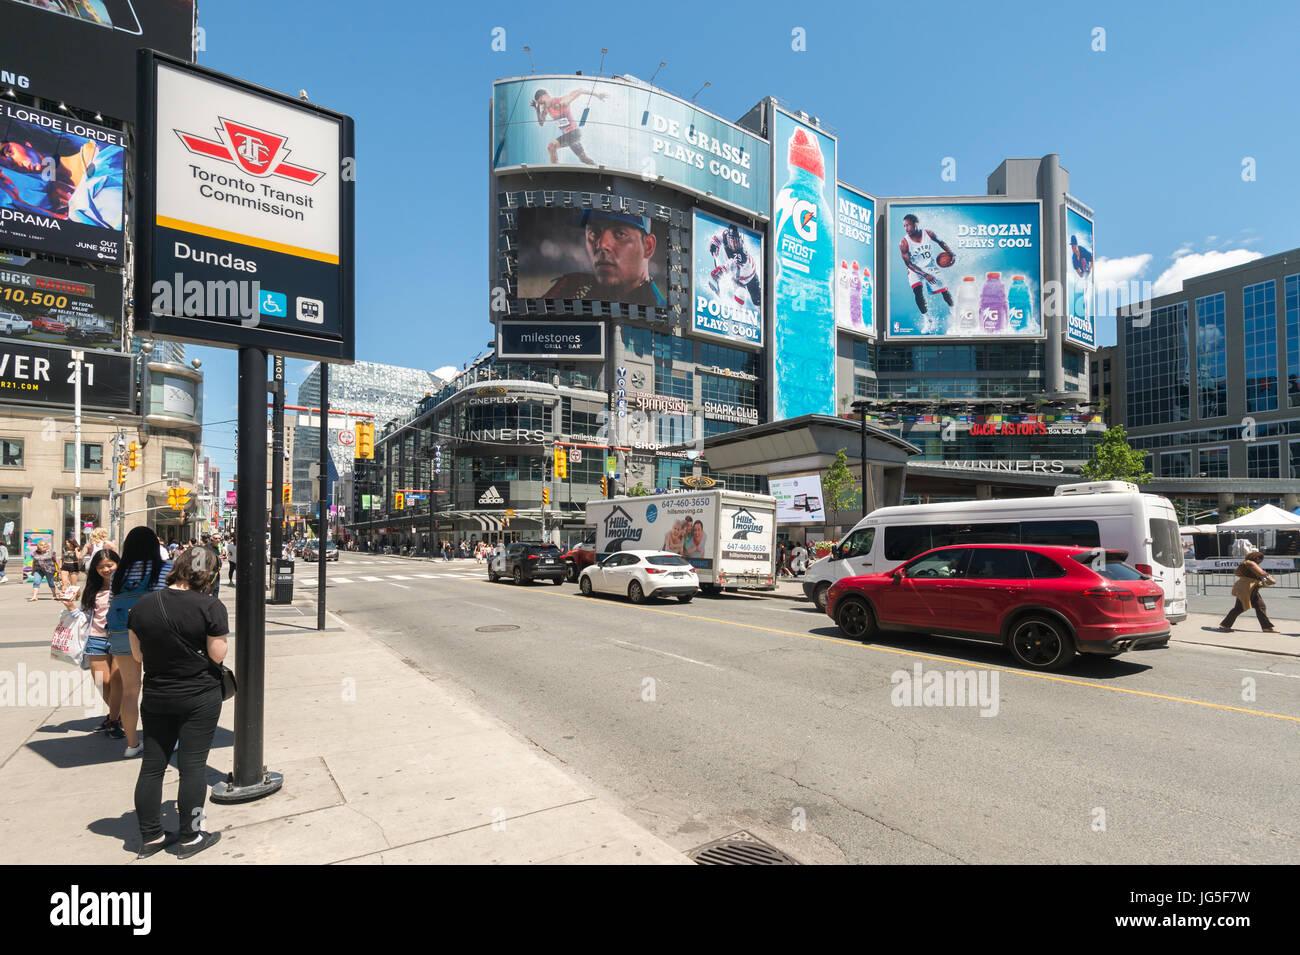 Toronto, CA - 24 June 2017: Traffic on Yonge-Dundas Square - Stock Image